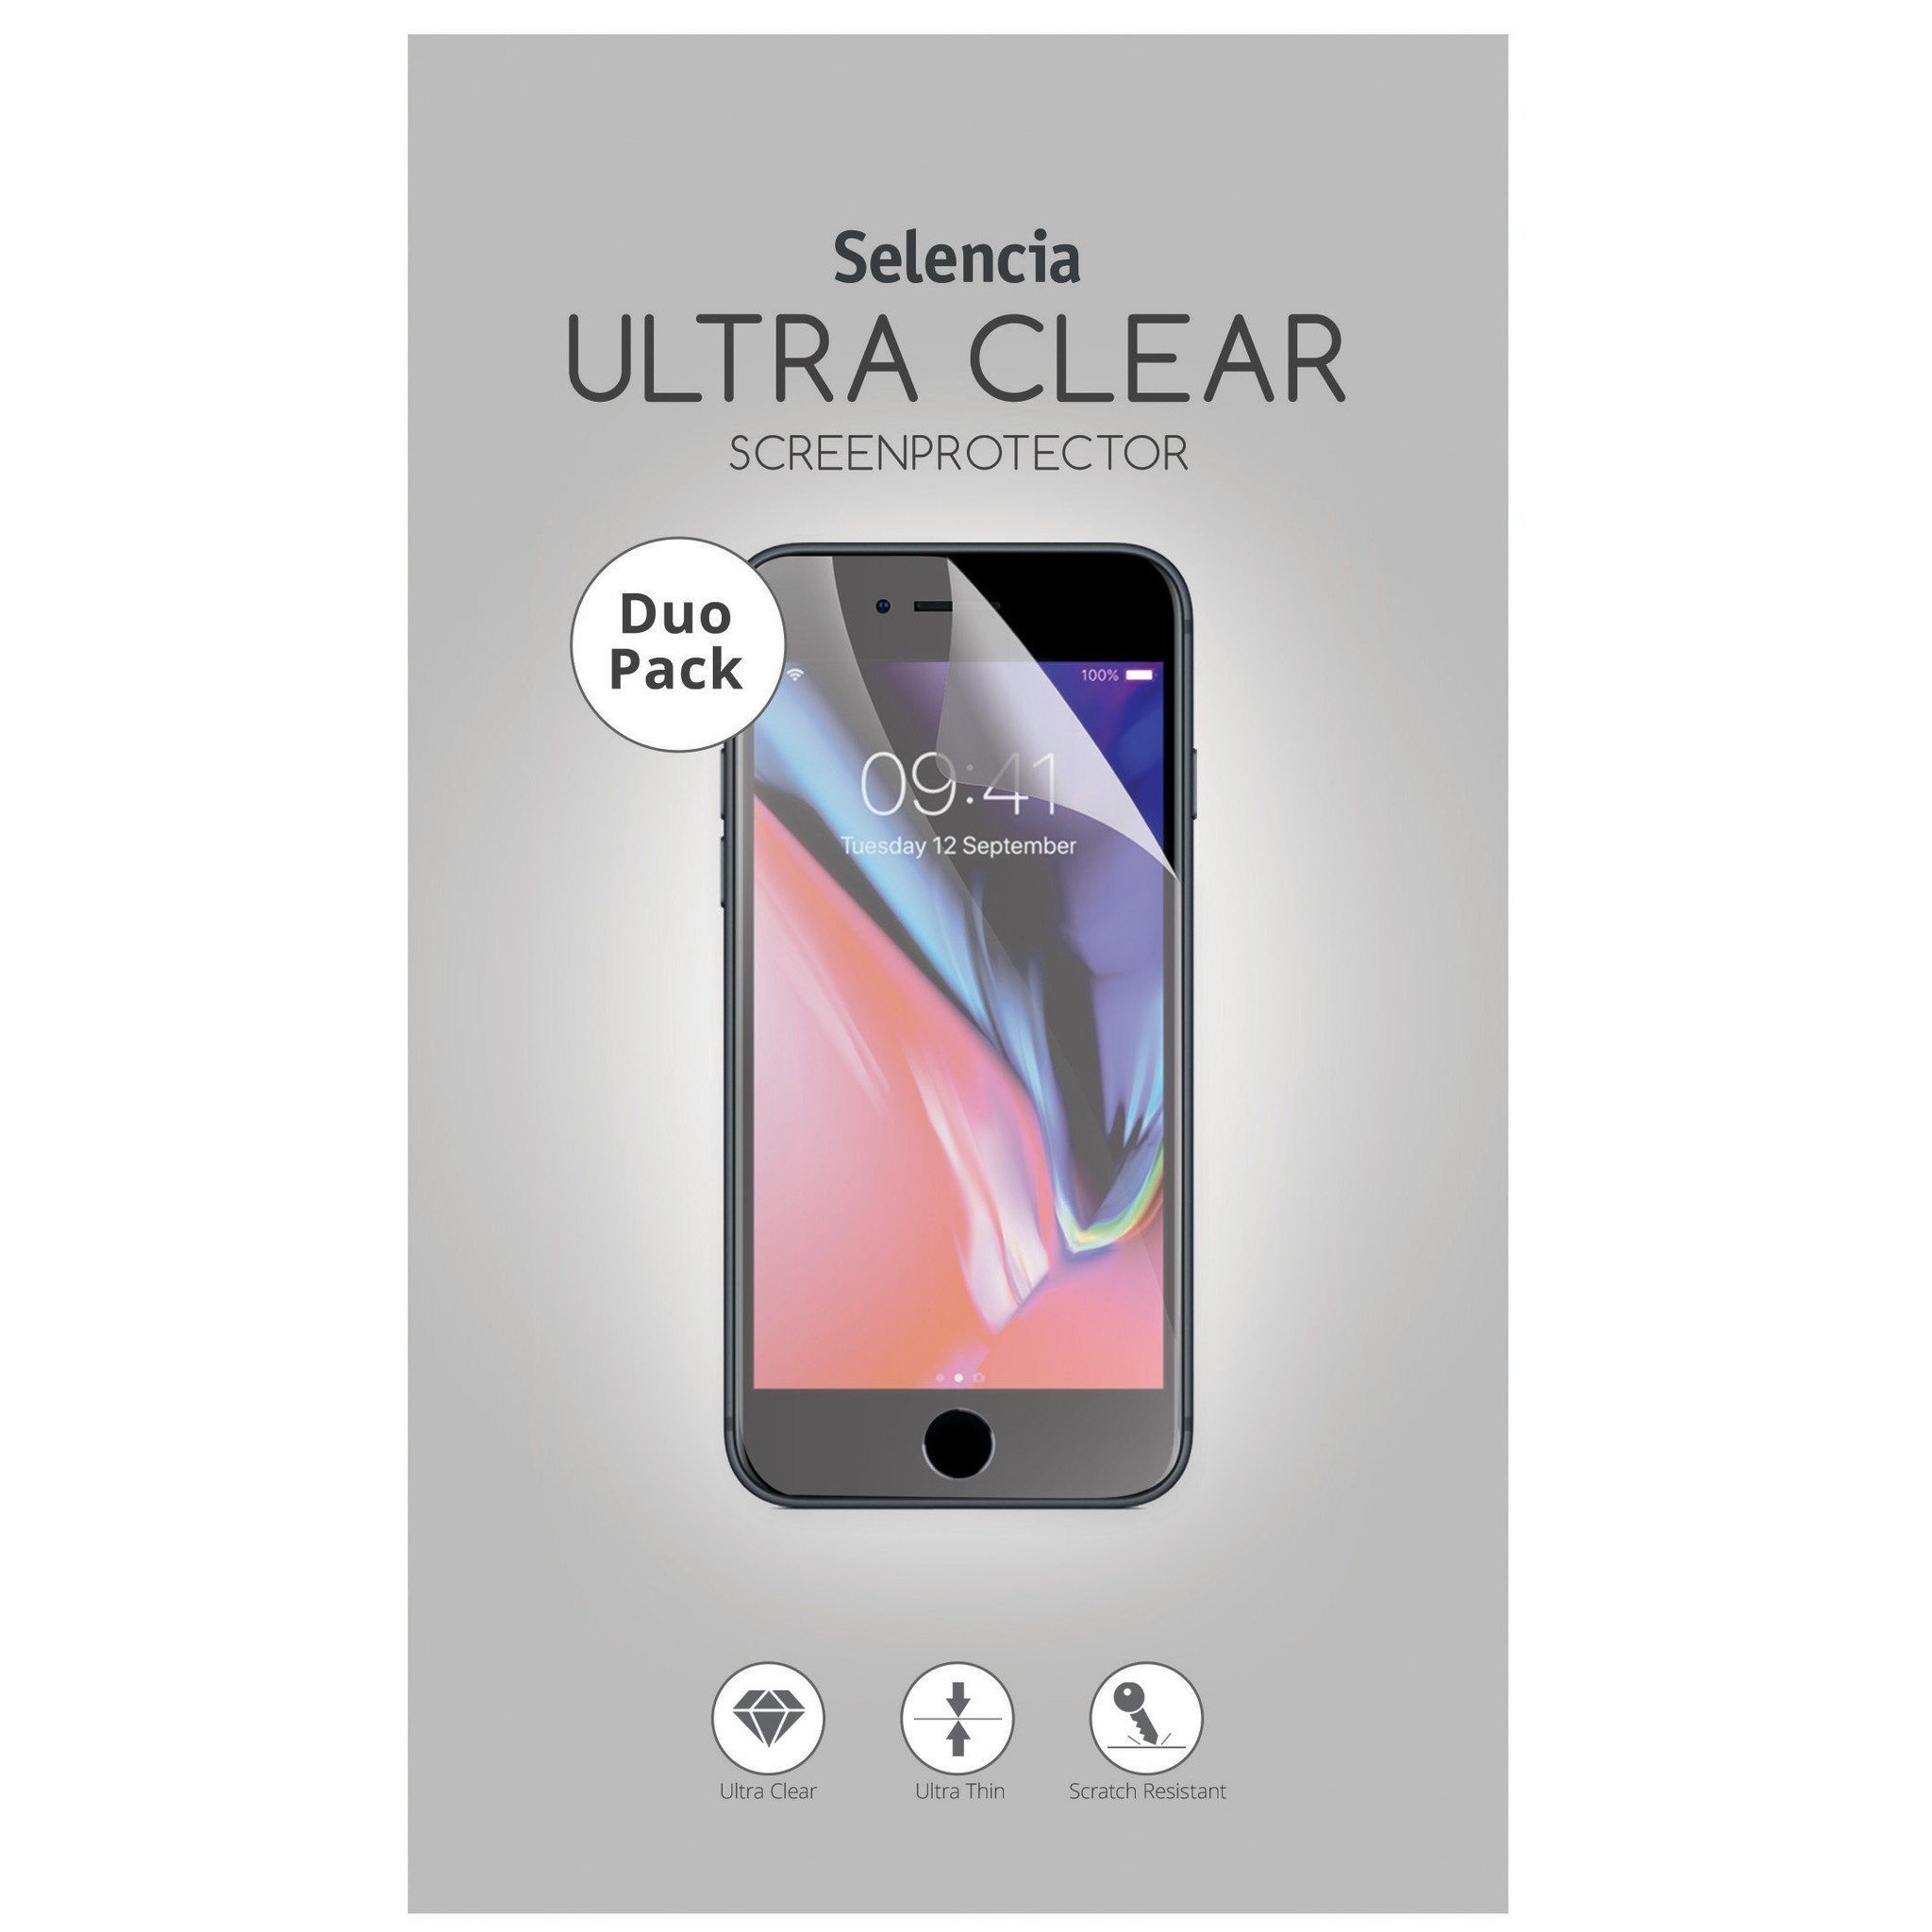 Selencia Duo Pack Screenprotector für das Huawei P20